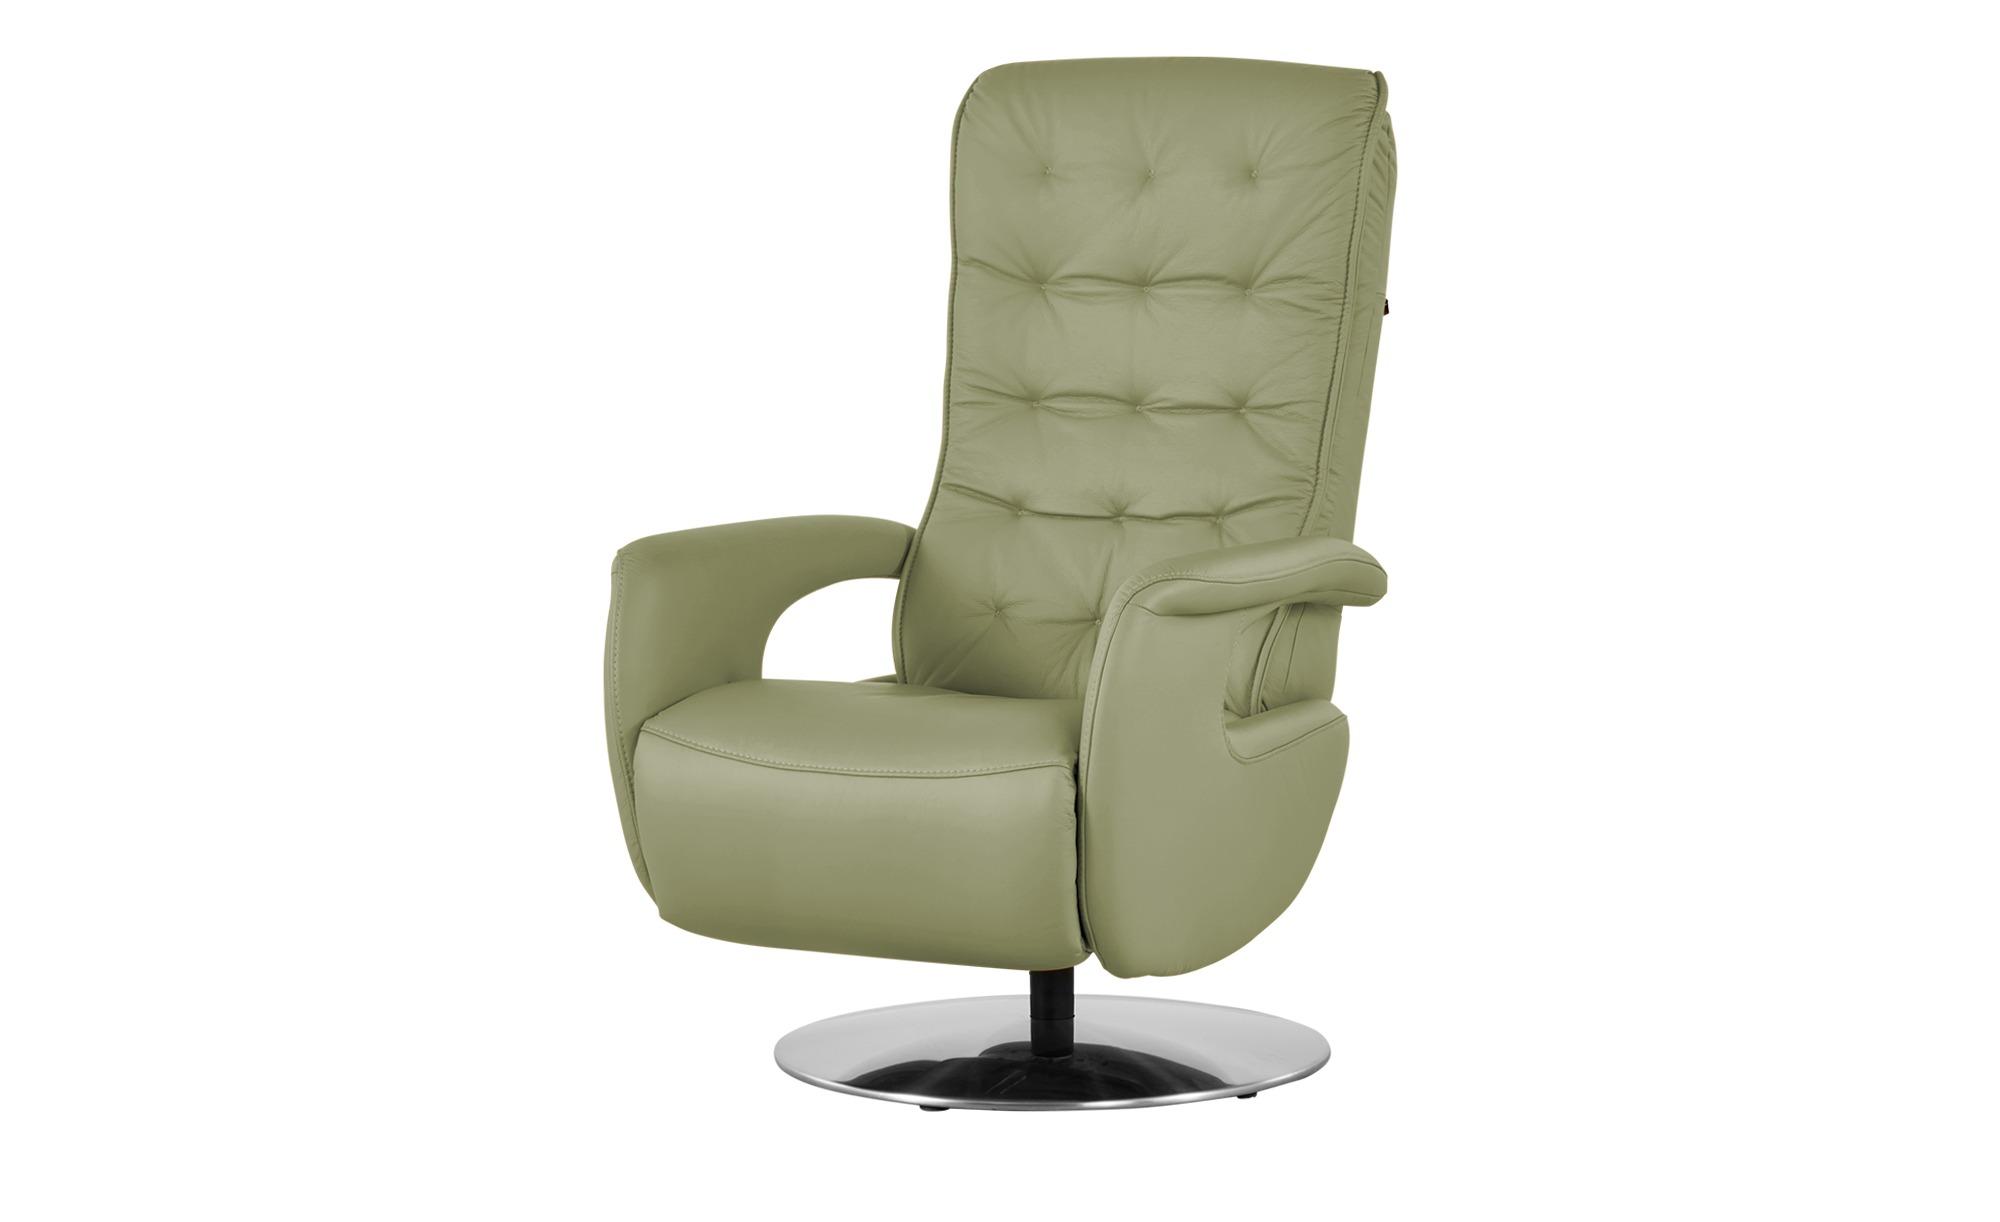 Hukla Relaxsessel  Smilla ¦ grün ¦ Maße (cm): B: 72 H: 113 T: 83 Polstermöbel > Sessel > Ledersessel - Höffner